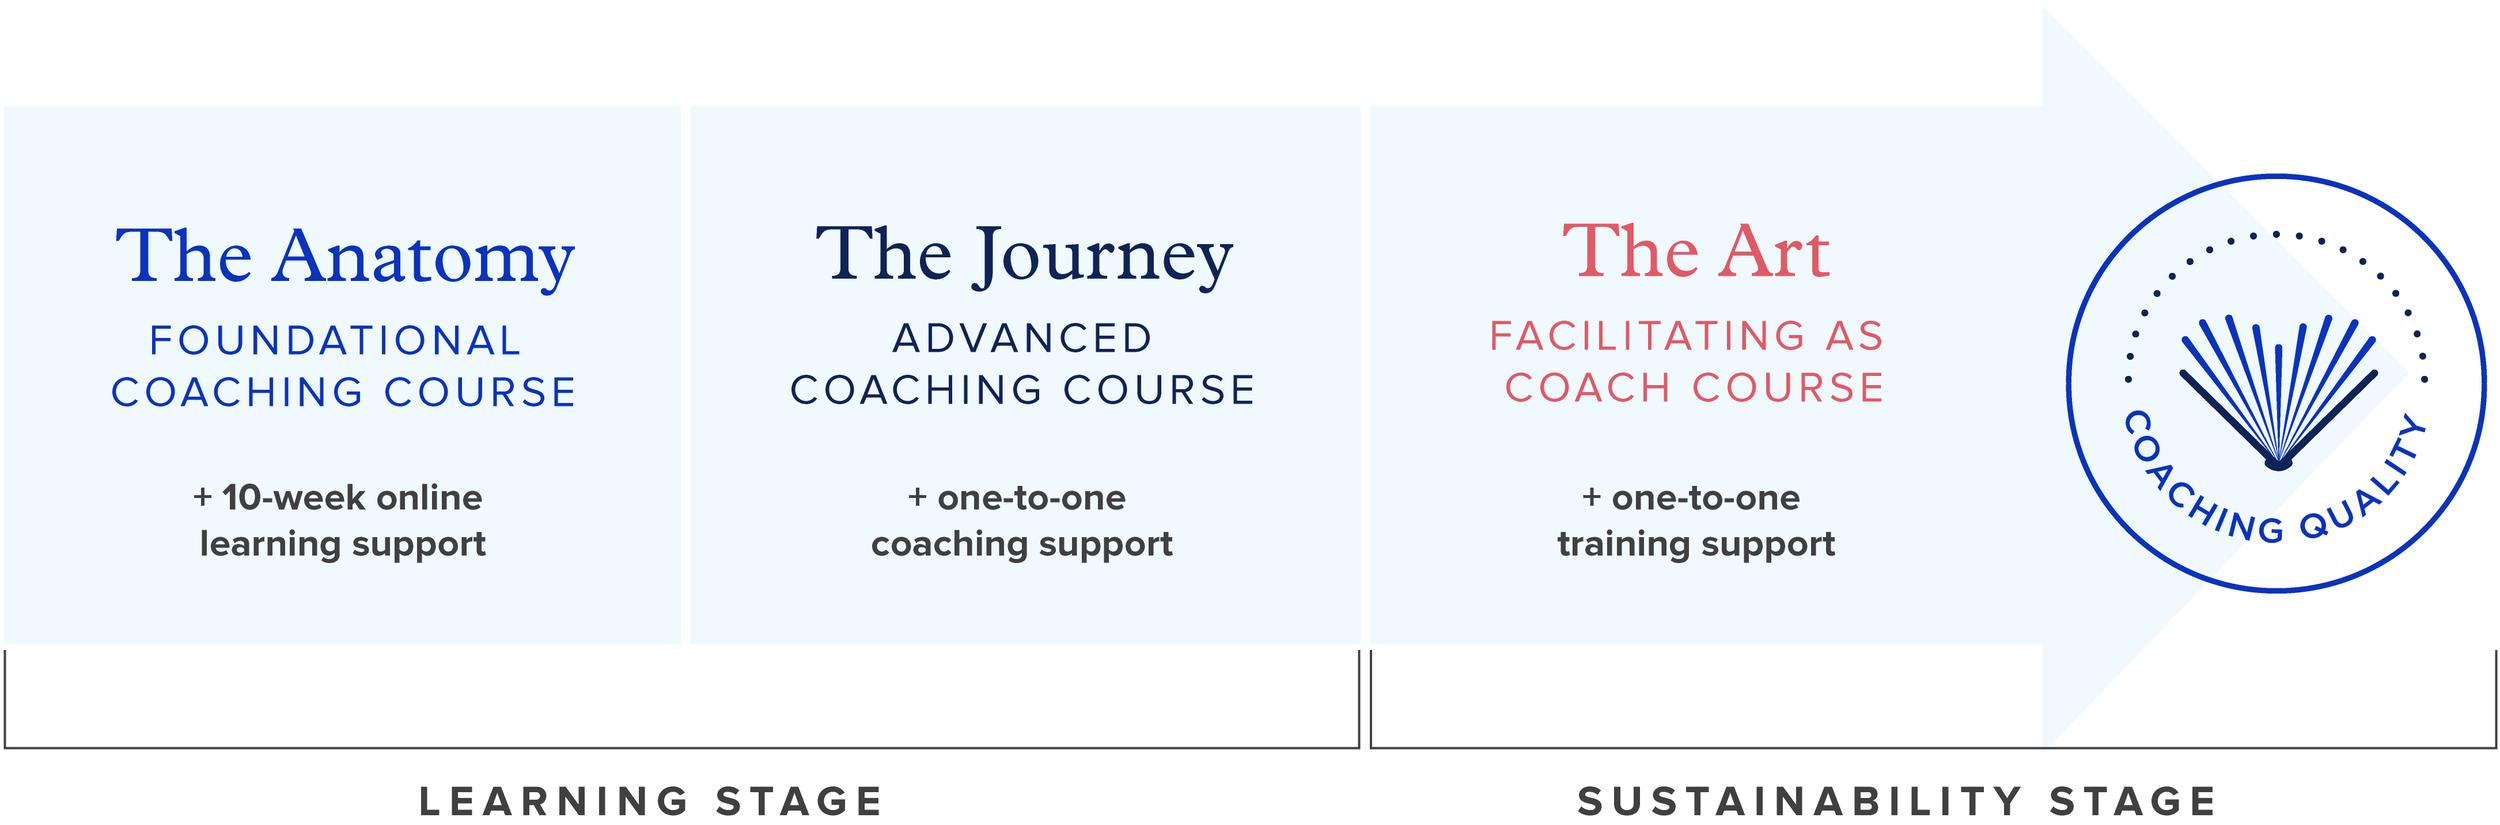 Graydin_Coaching_Courses_Schools_Educators_Teachers_Leaders_Administrators_Beginner_London_Toronto_NewYork_Picto-new-25.png